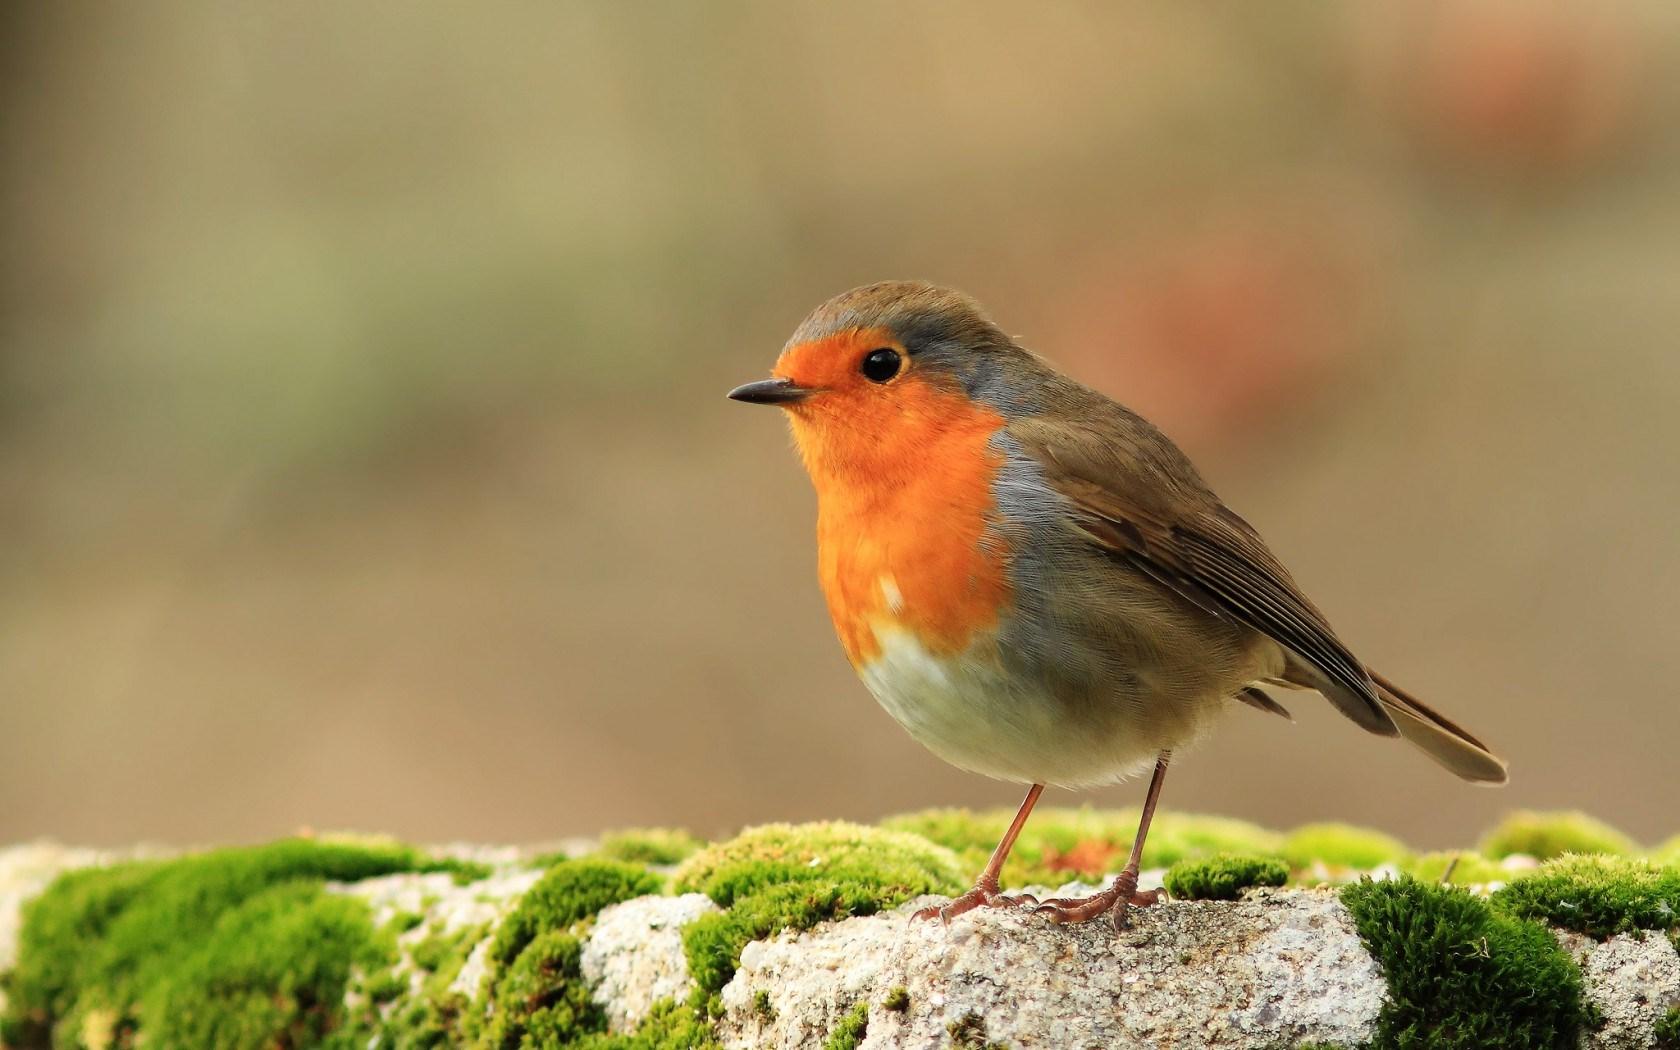 Fall Wallpaper Screensavers 3 Hd Robin Bird Wallpapers